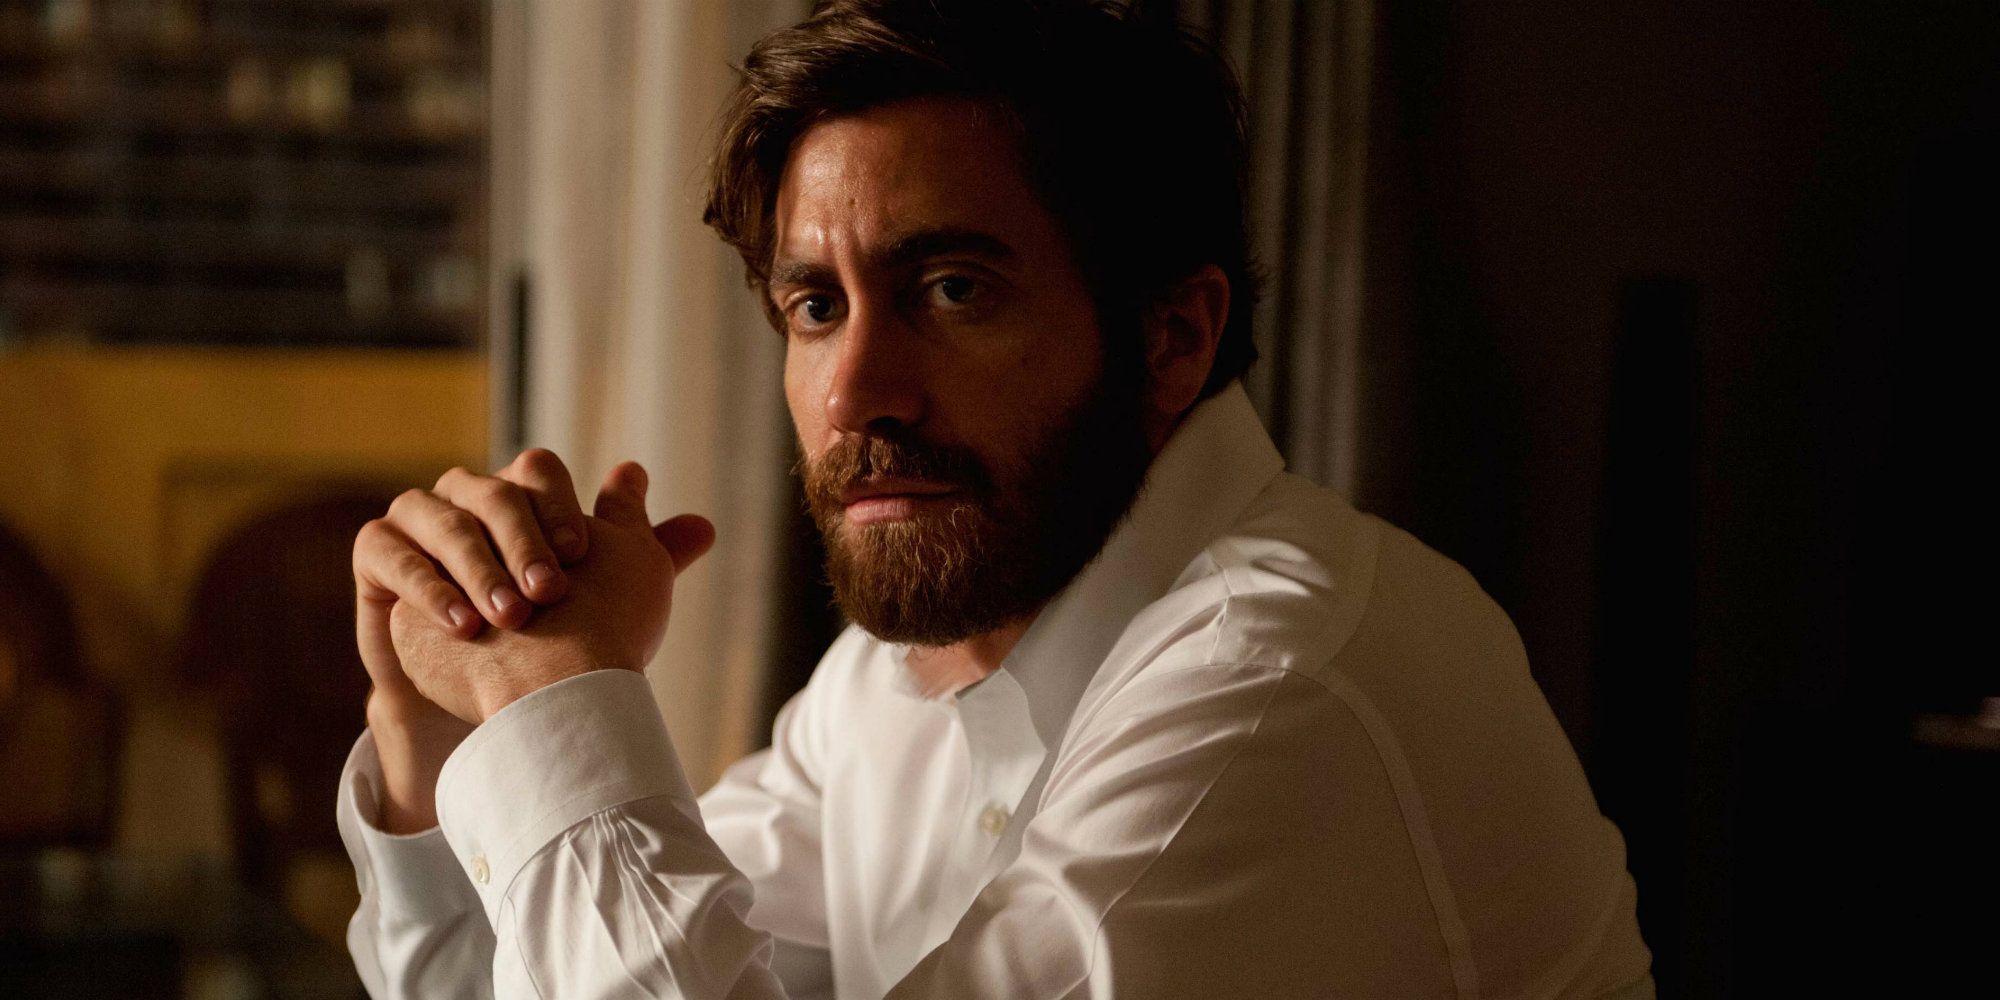 Jake Gyllenhaal Reuniting With Director Denis Villeneuve For New Movie